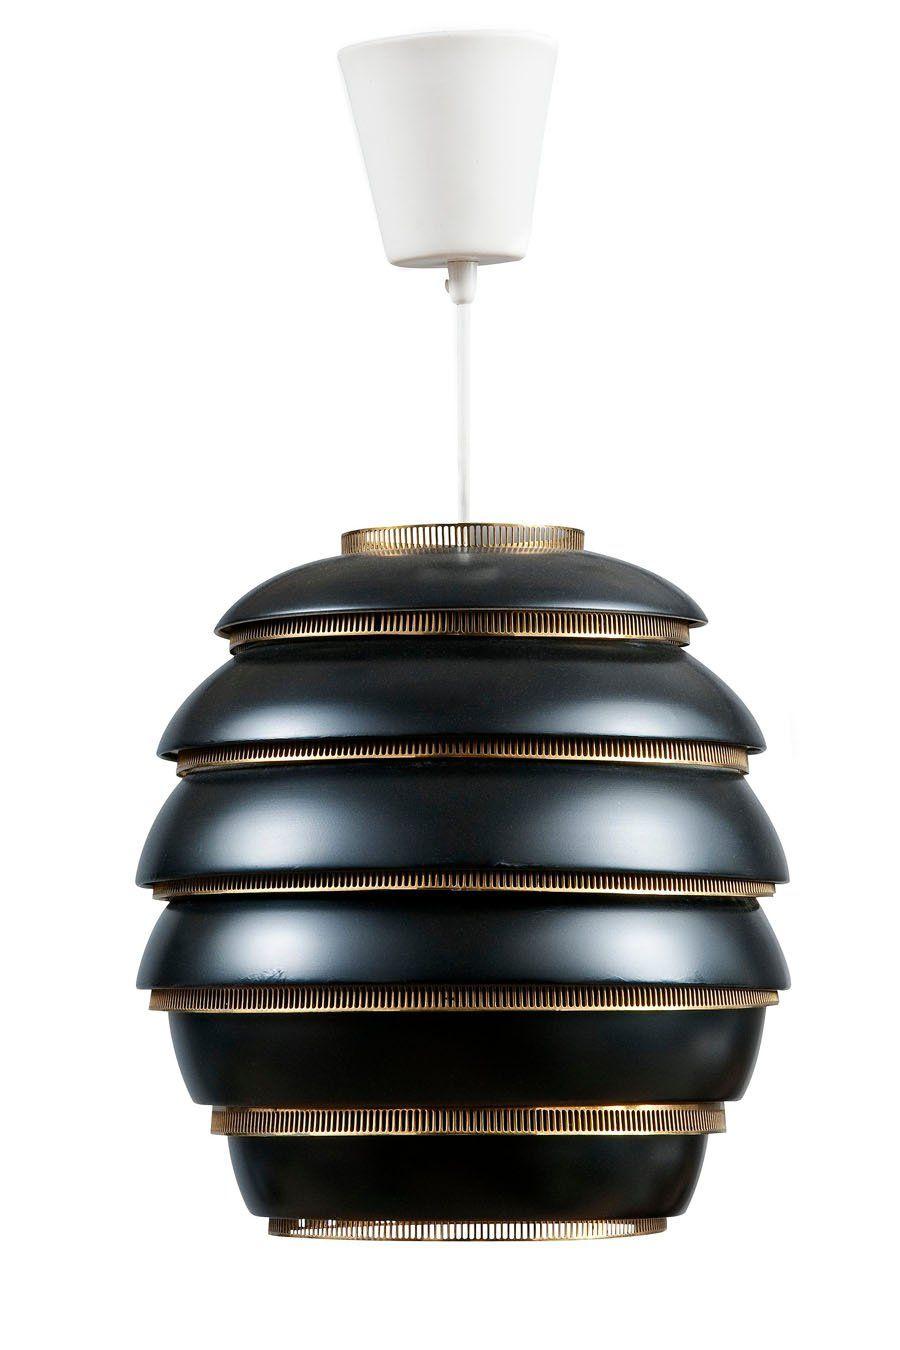 aalto lampe gallerie images der daadbbcccccabd